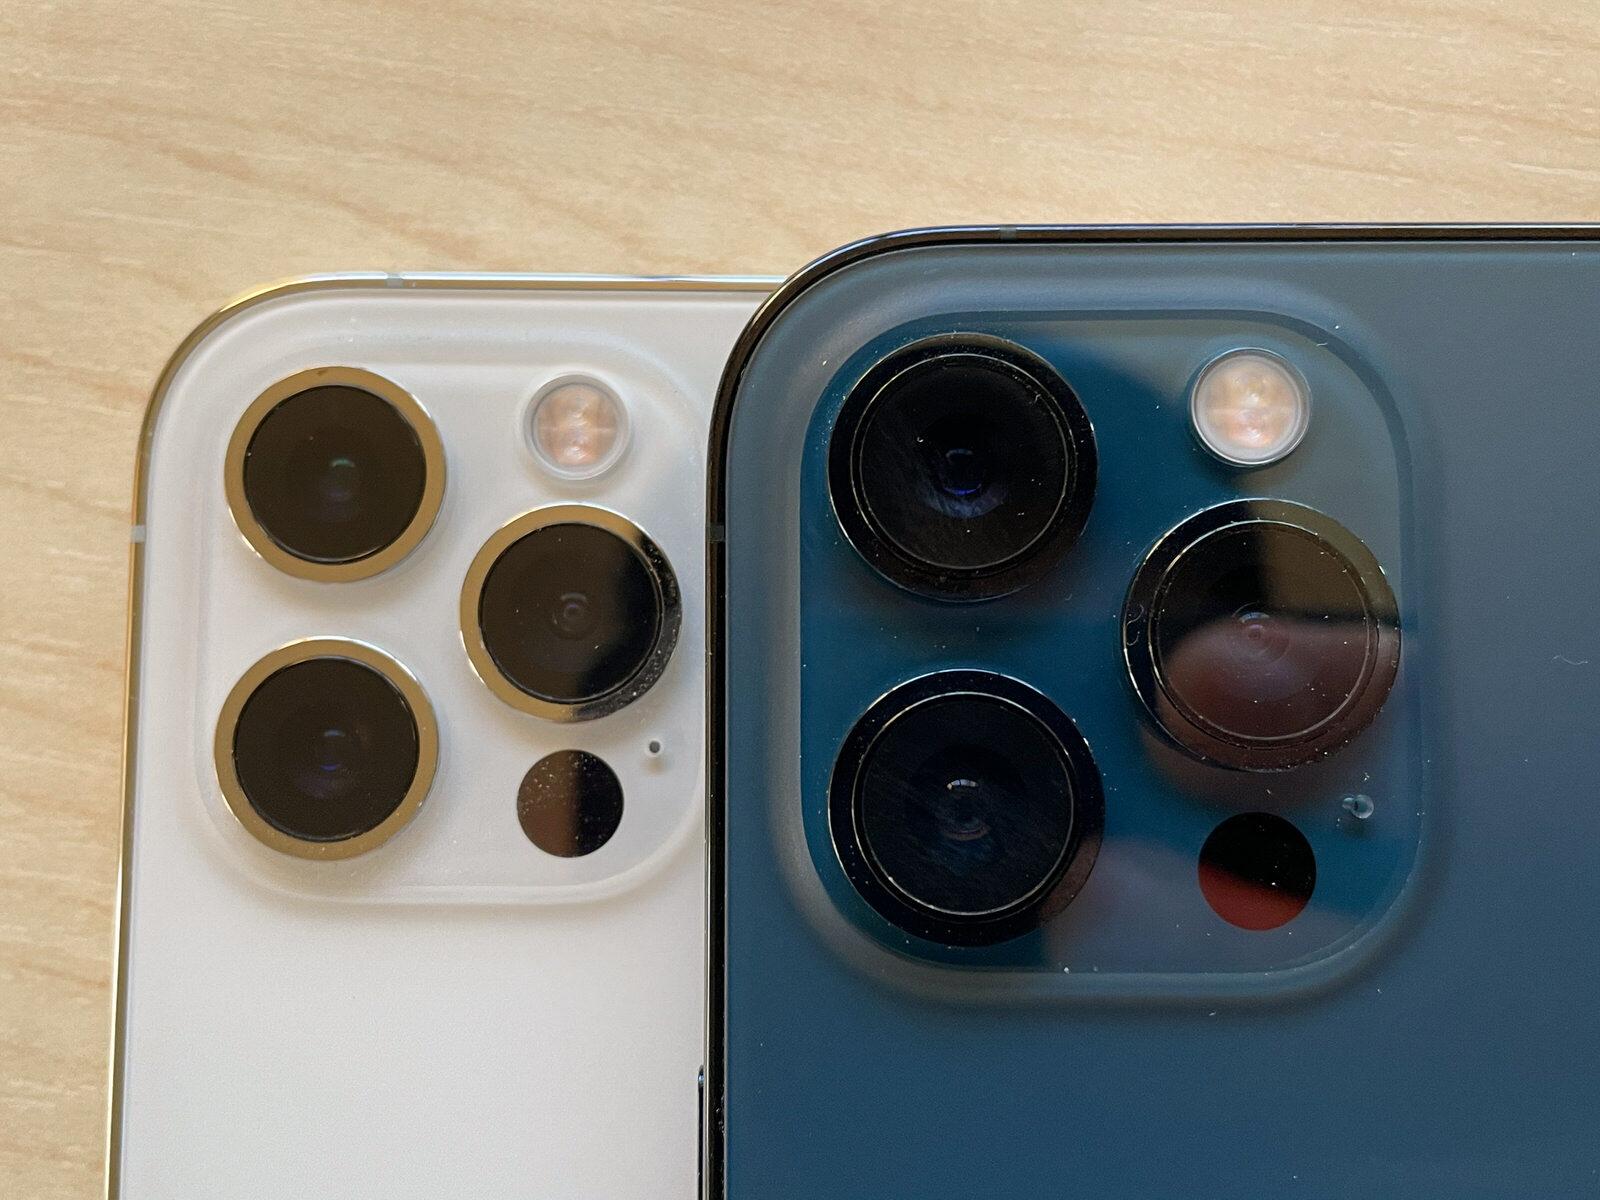 uiguri iphone lens technology